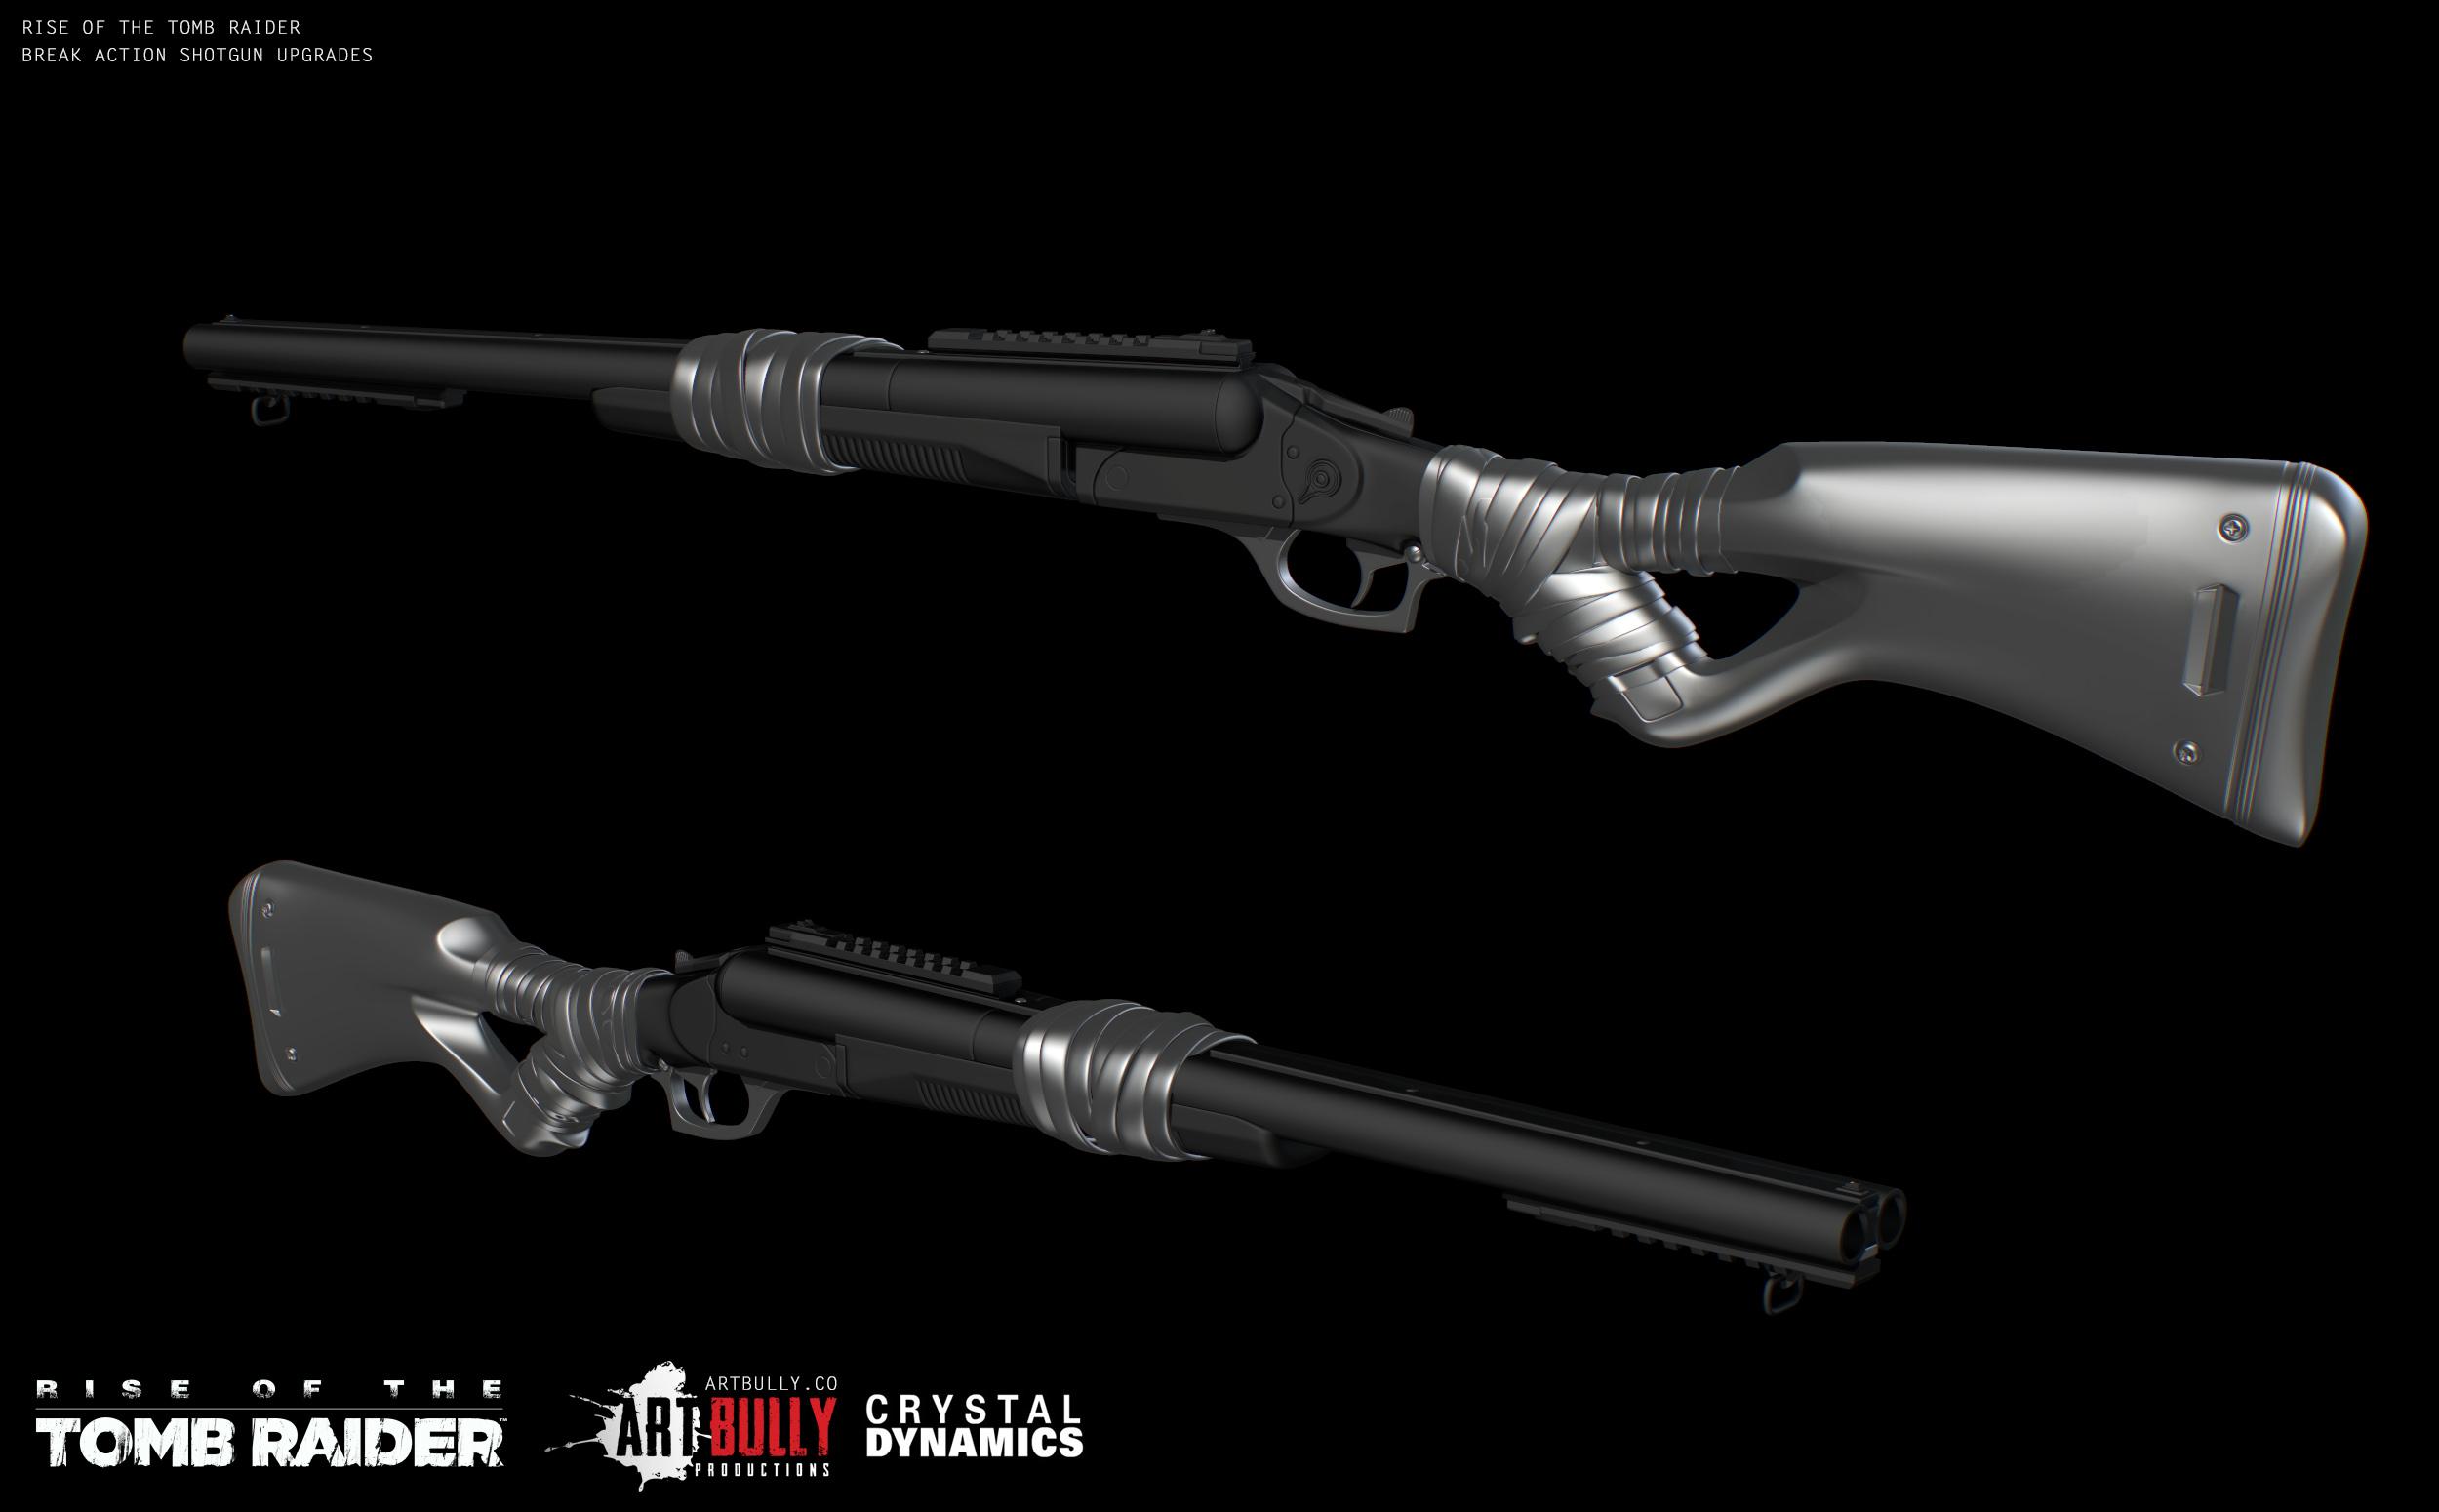 breal_action_shotgun copy.jpg